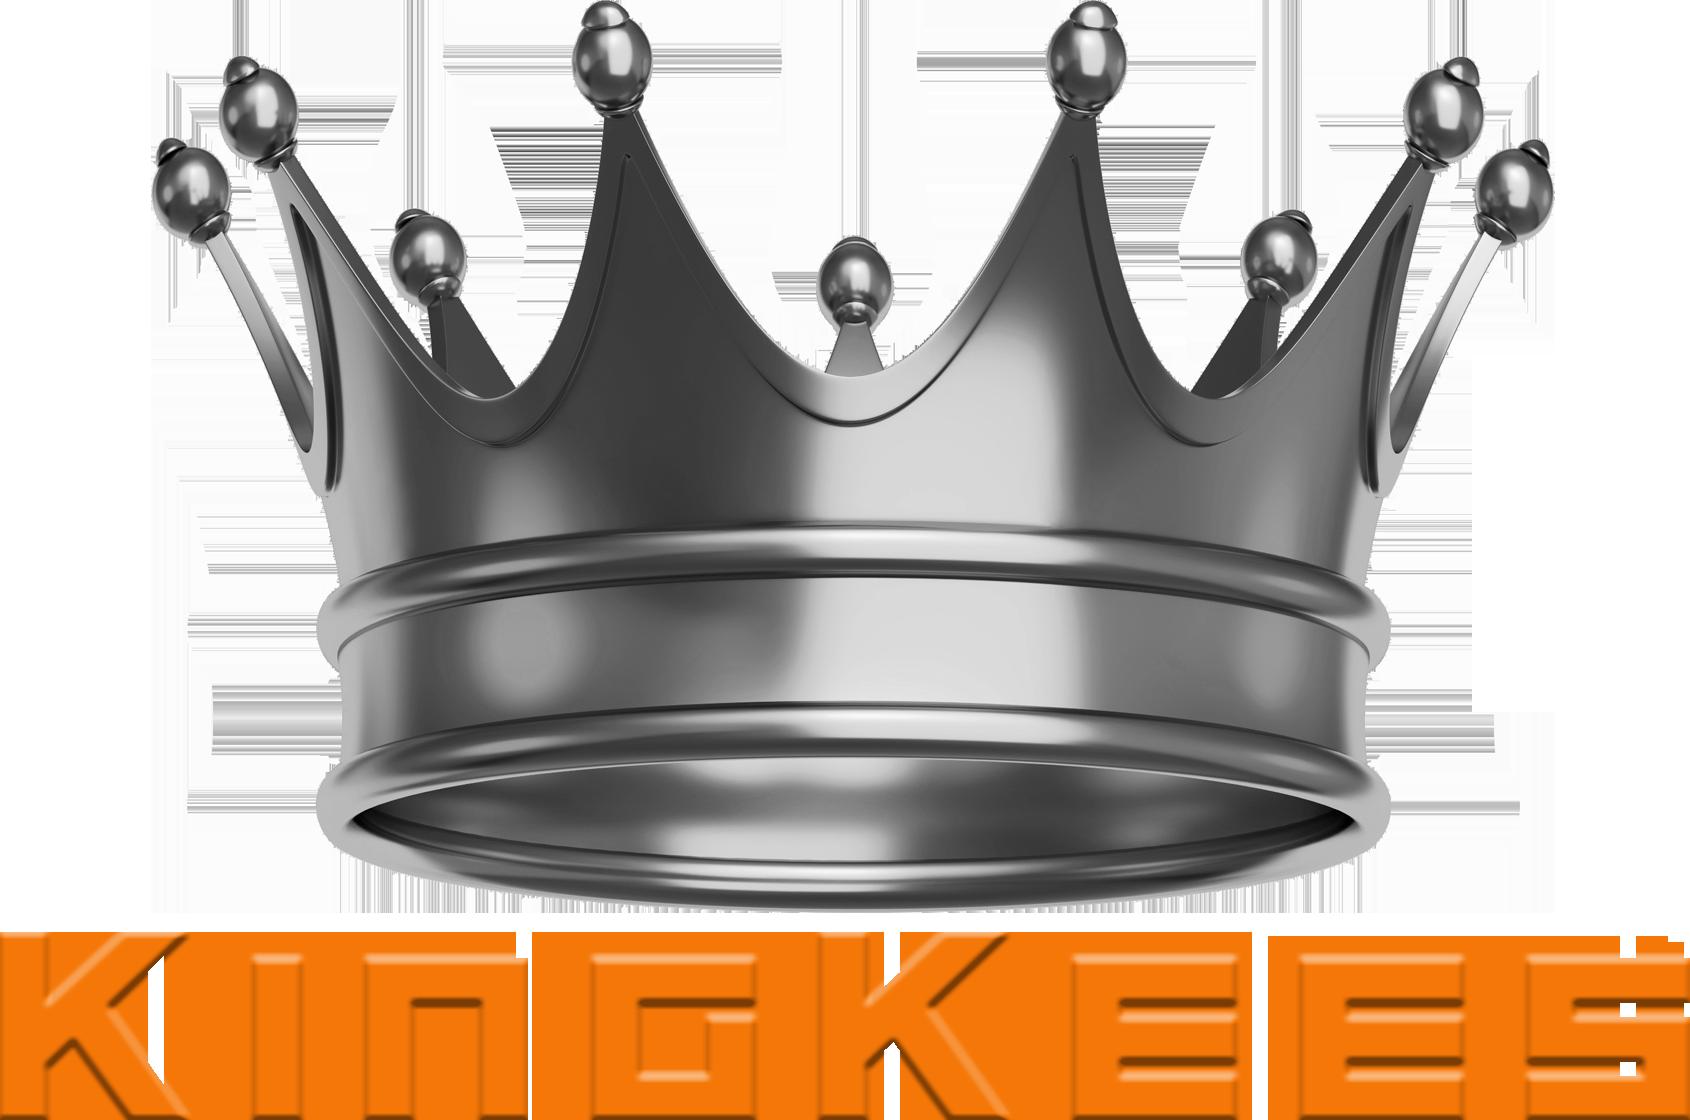 KingKees B.V.